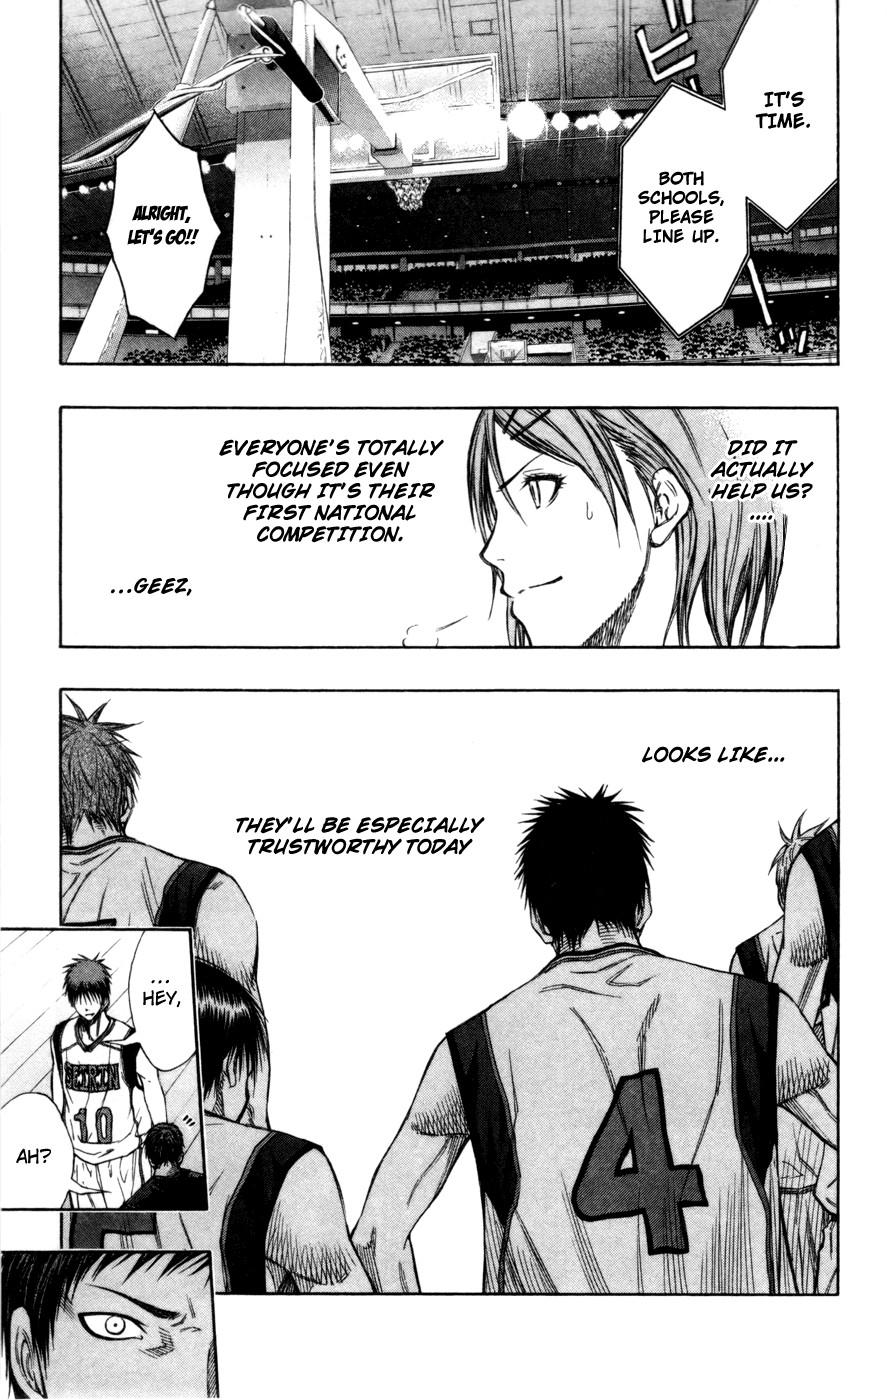 Kuroko no Basket Manga Chapter 114 - Image 13